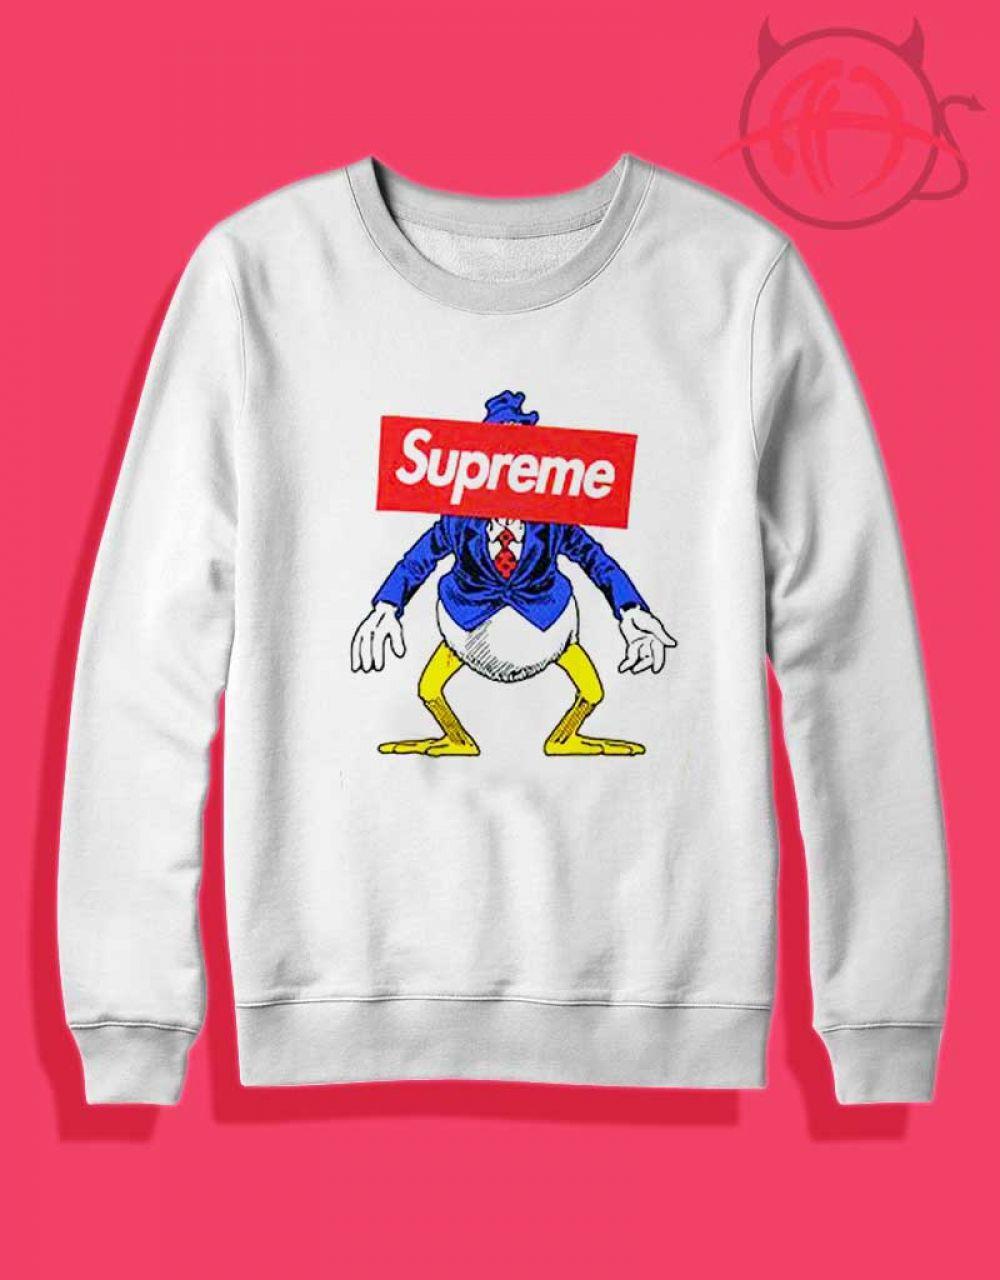 4d4071ab6e5b Rare Vintage Disney Supreme Donald Duck Sweatshirt $ 27.50 #Tee #Hype  #Outfits #Outfit #Hypebeast #fashion #shirt #Tees #Tops #Teen